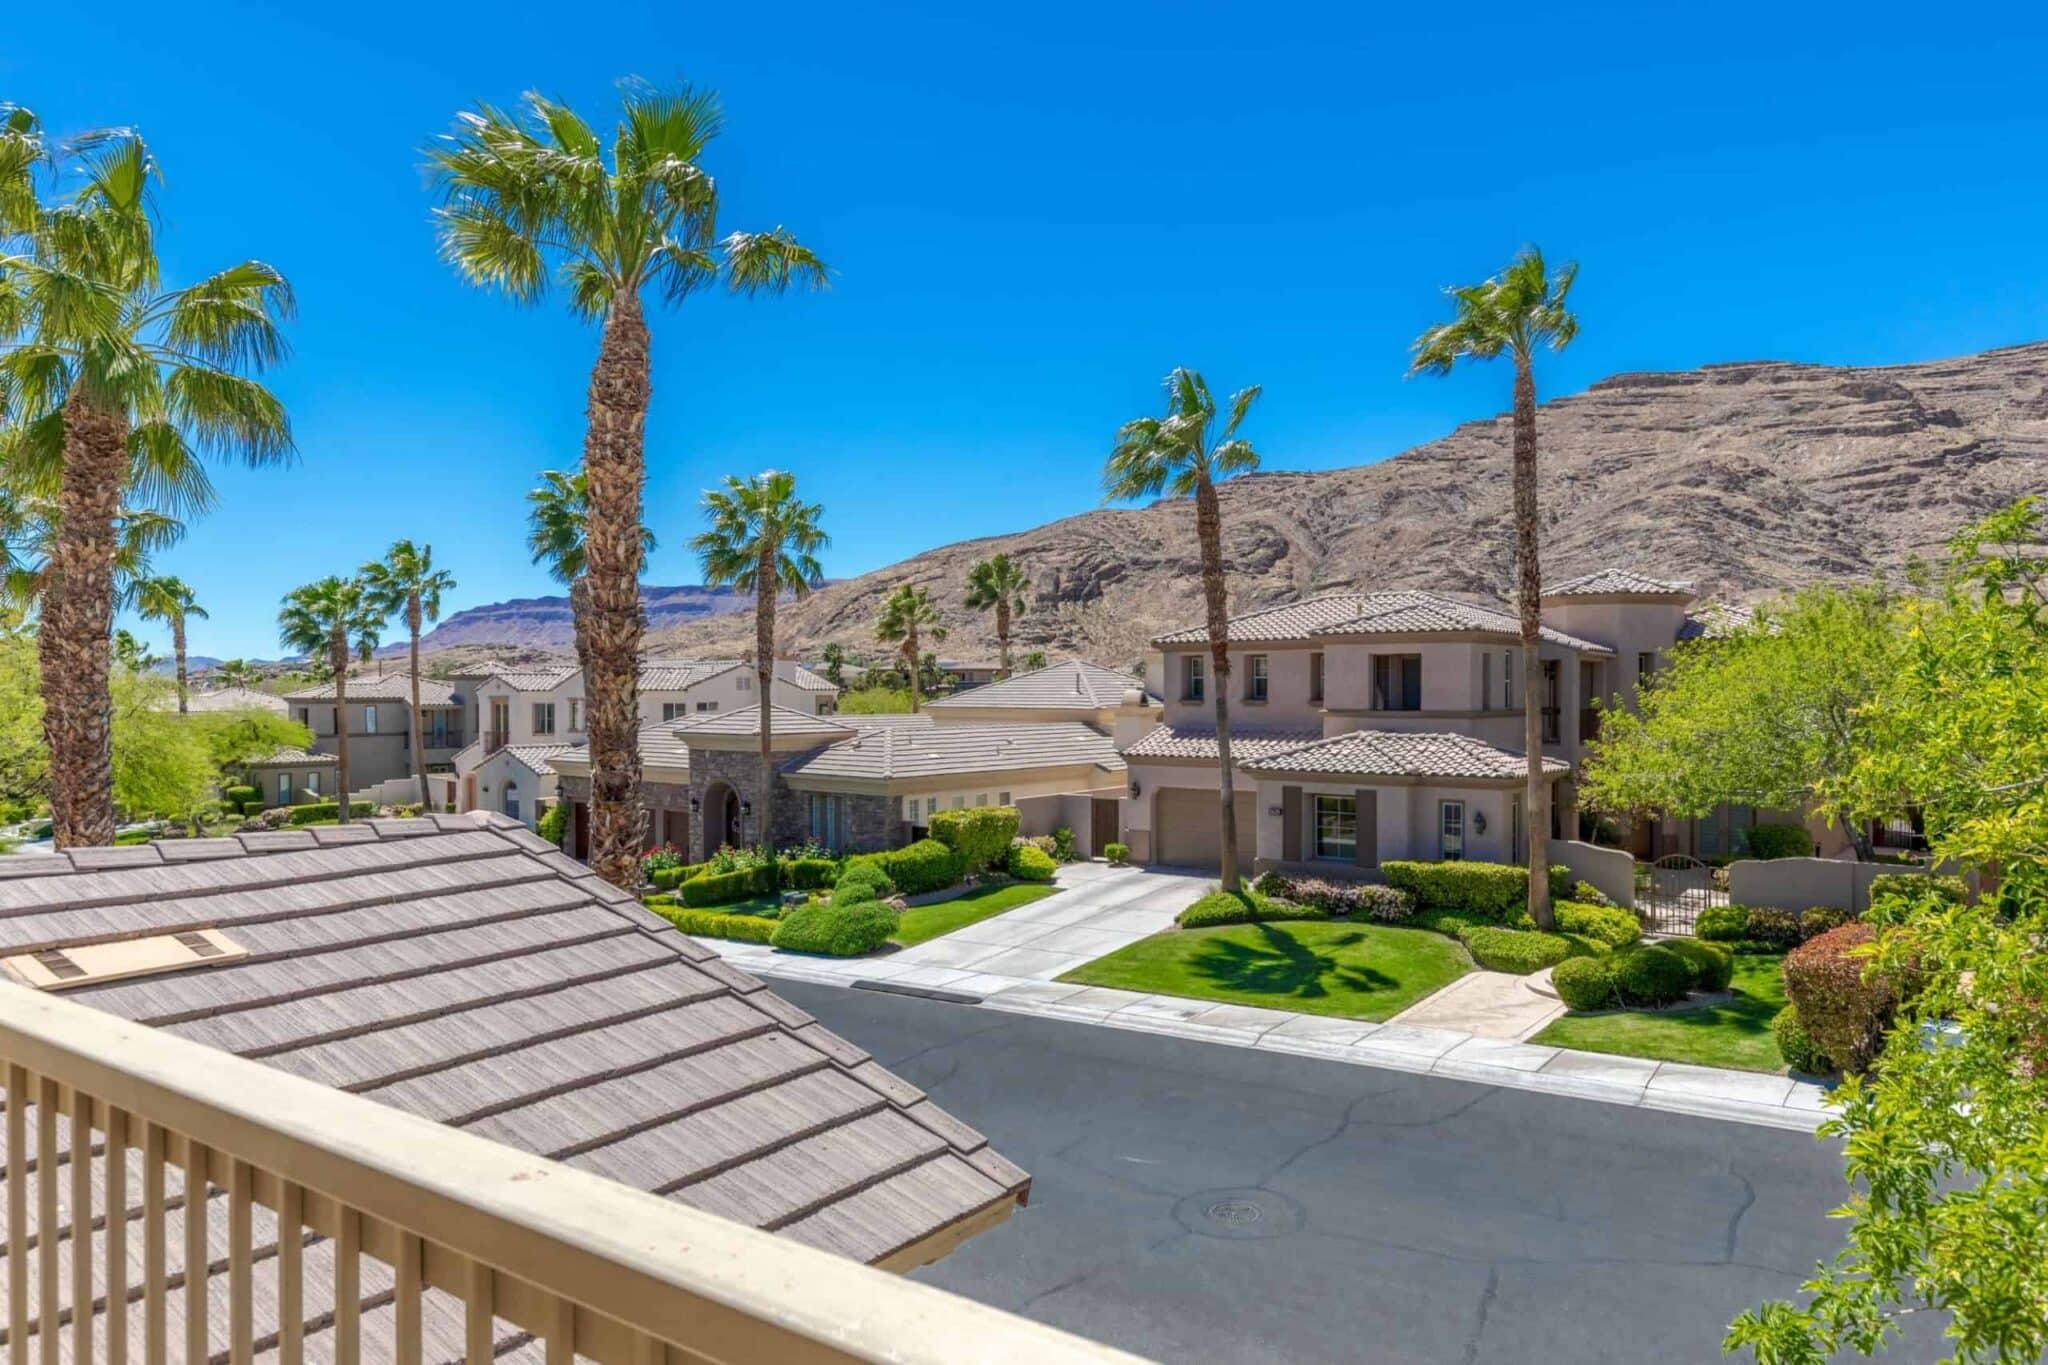 las-vegas-luxry-real-estate-realtor-rob-jensen-company-2620-grassy-spring-place-rrcc47